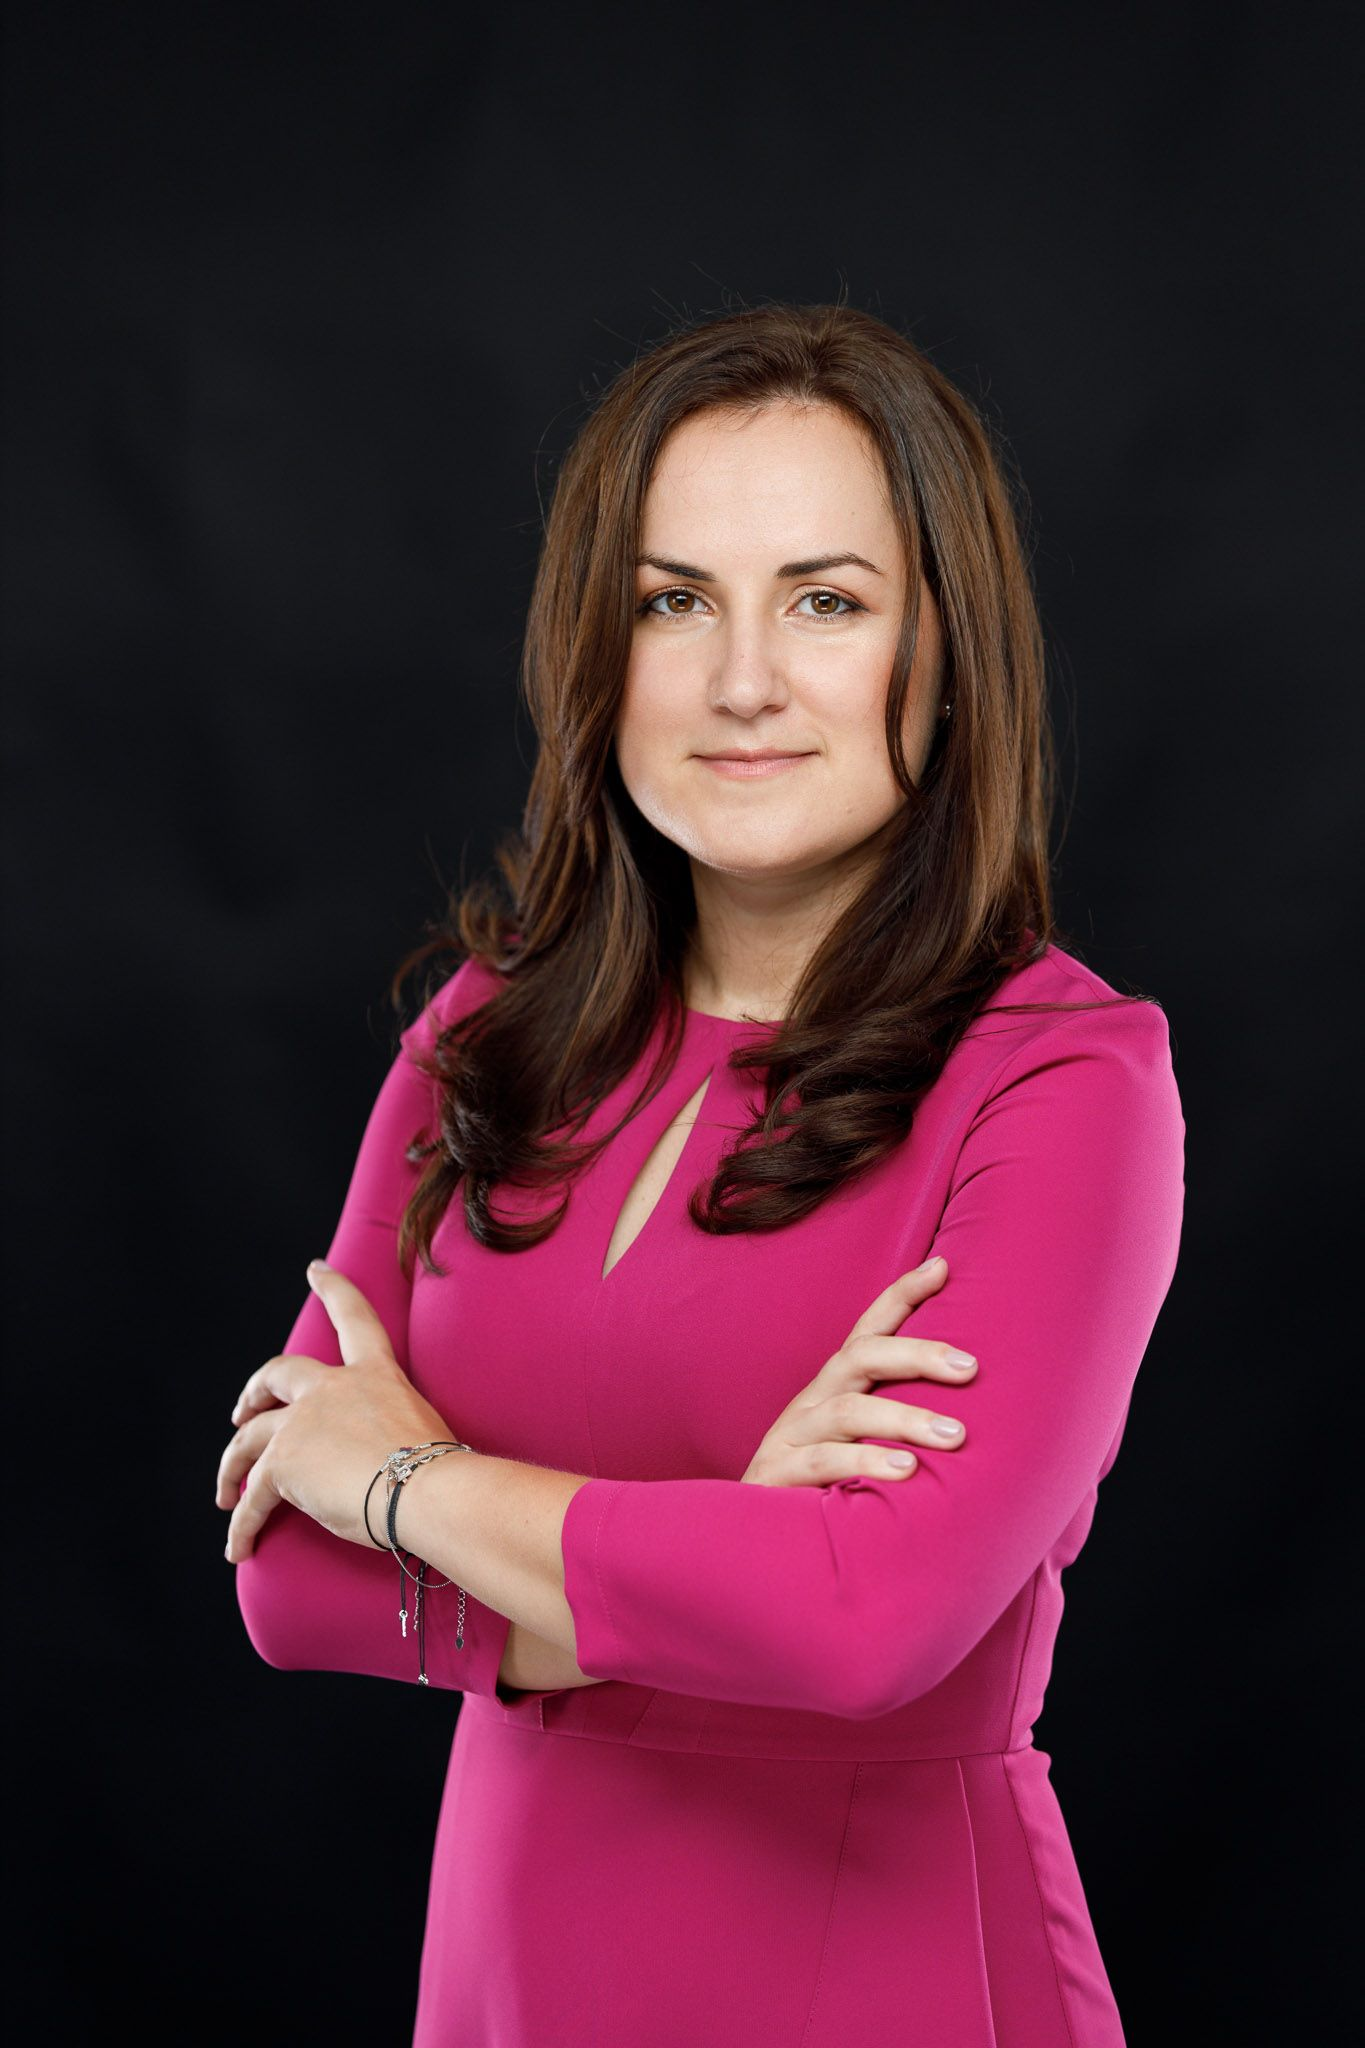 Alexandra Oros